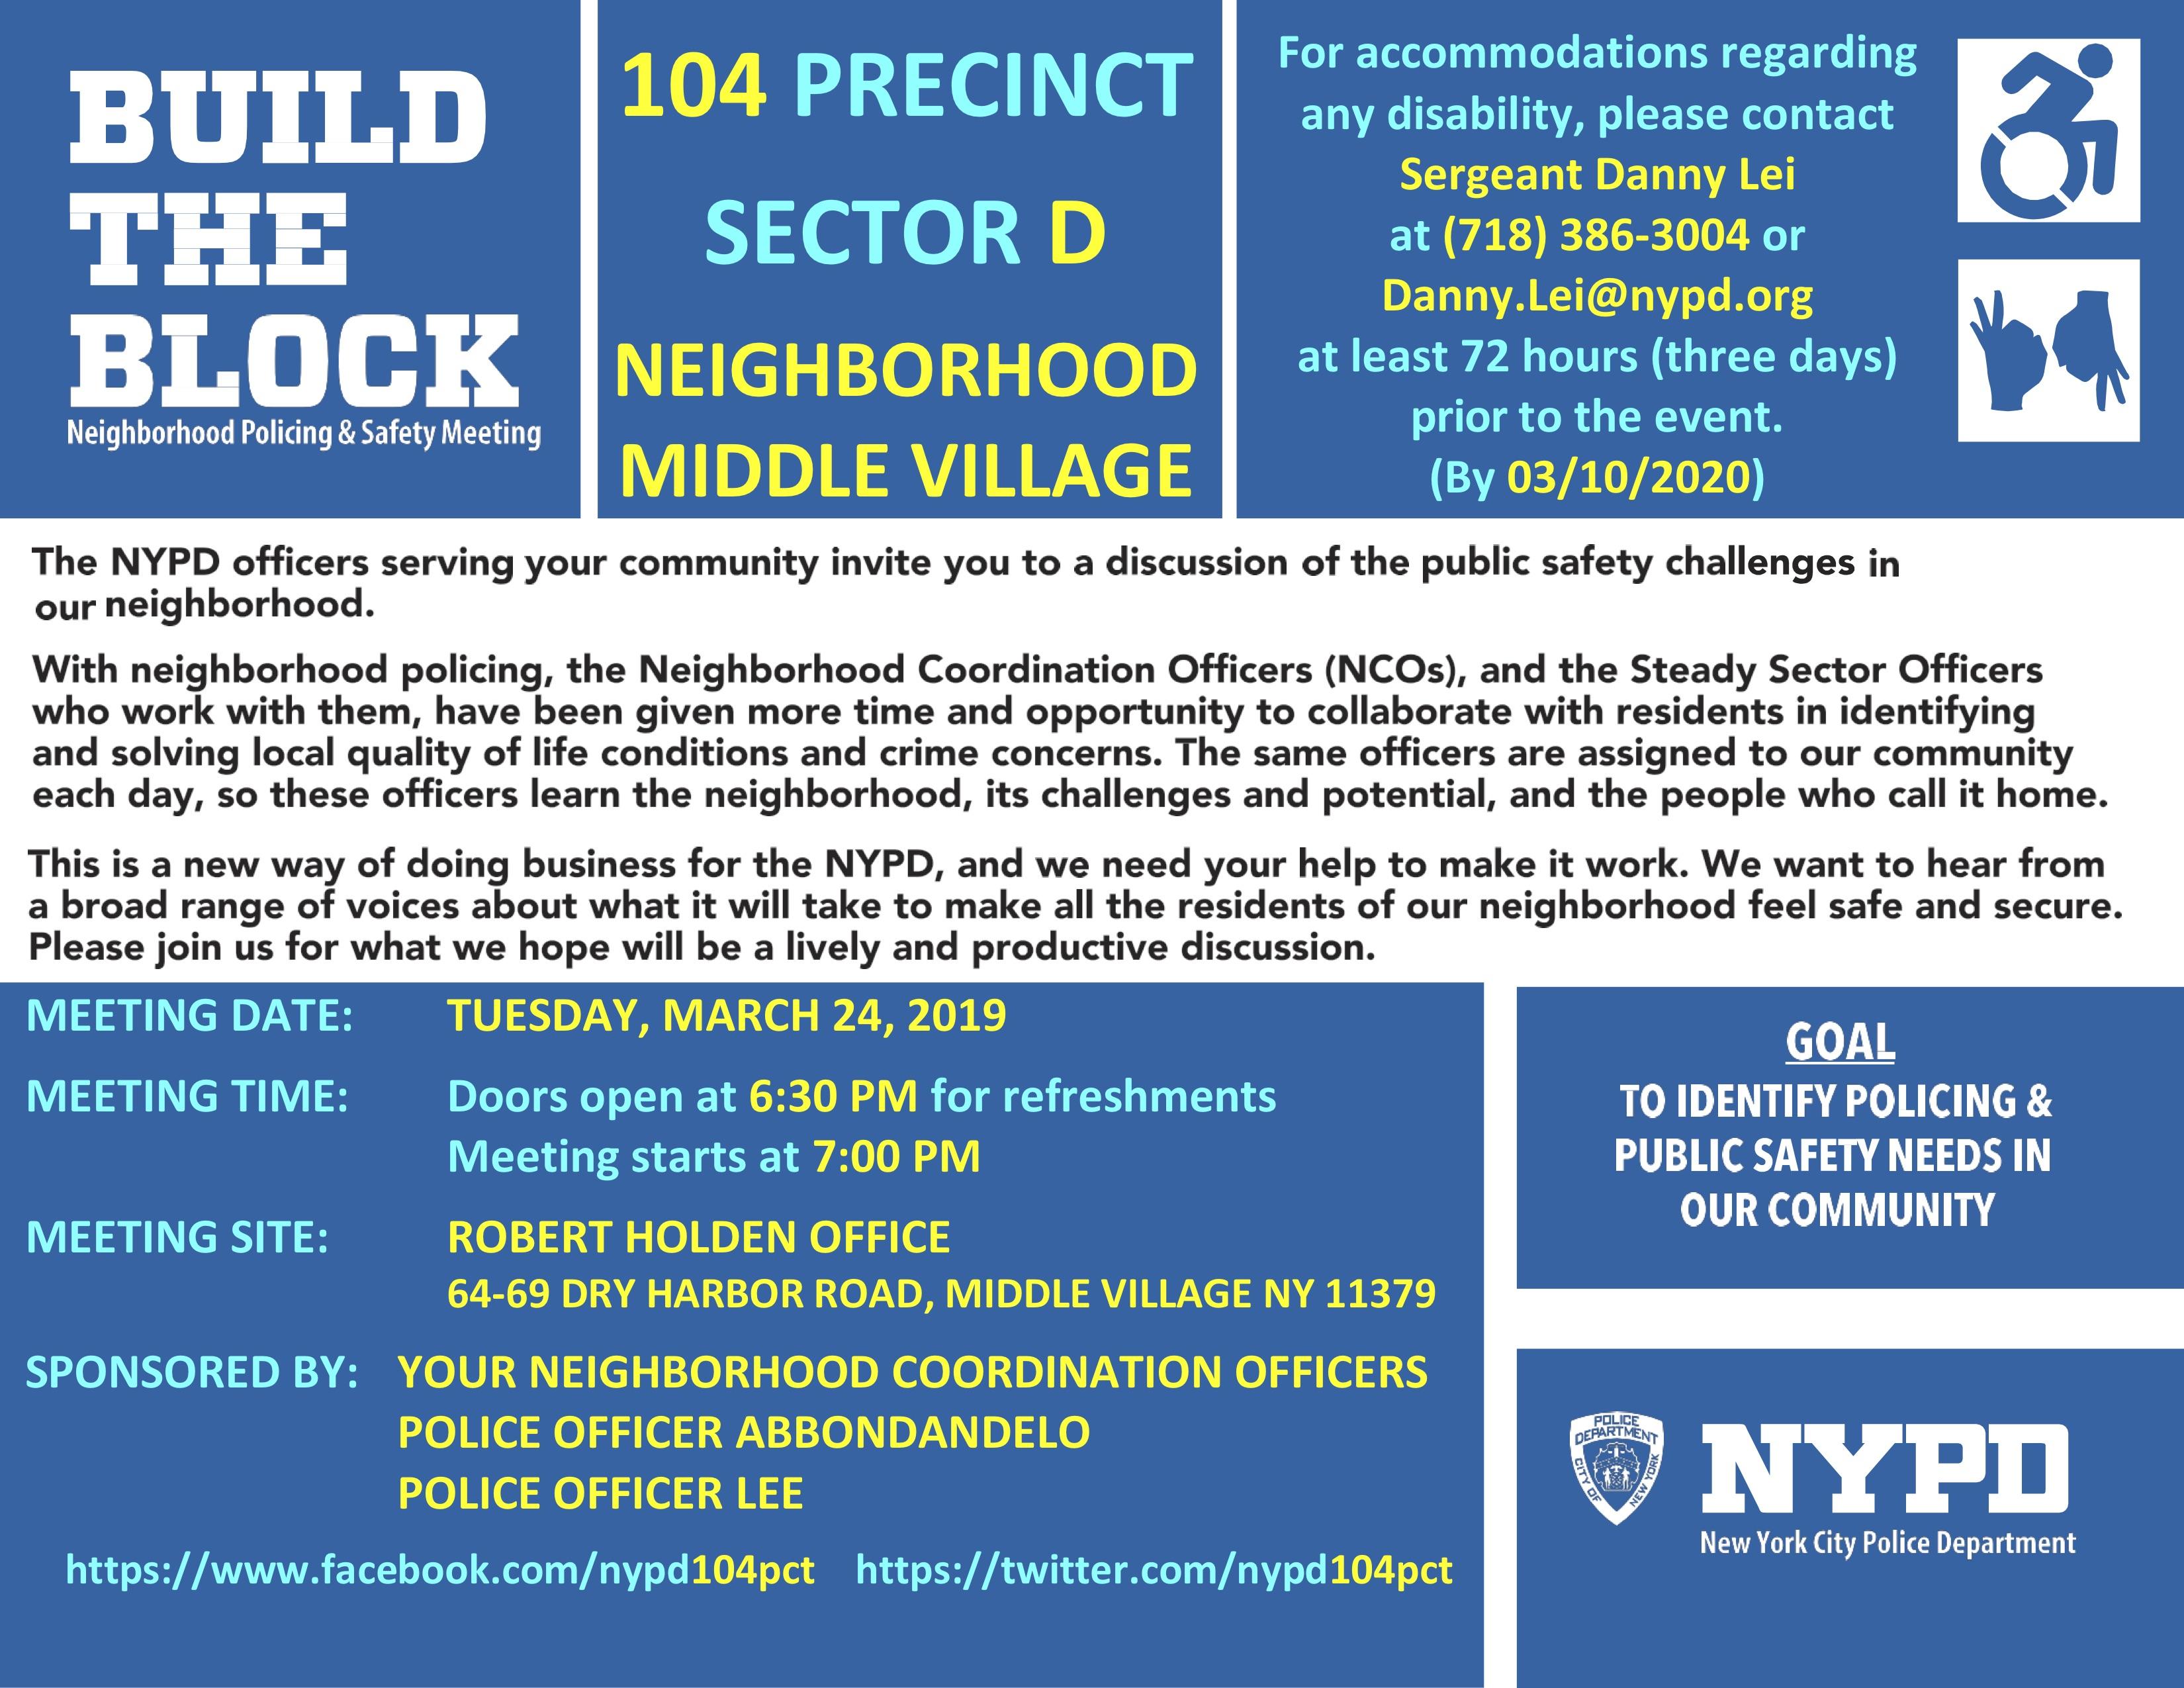 NYPD BTB Meeting Invitation Flyer Sector David